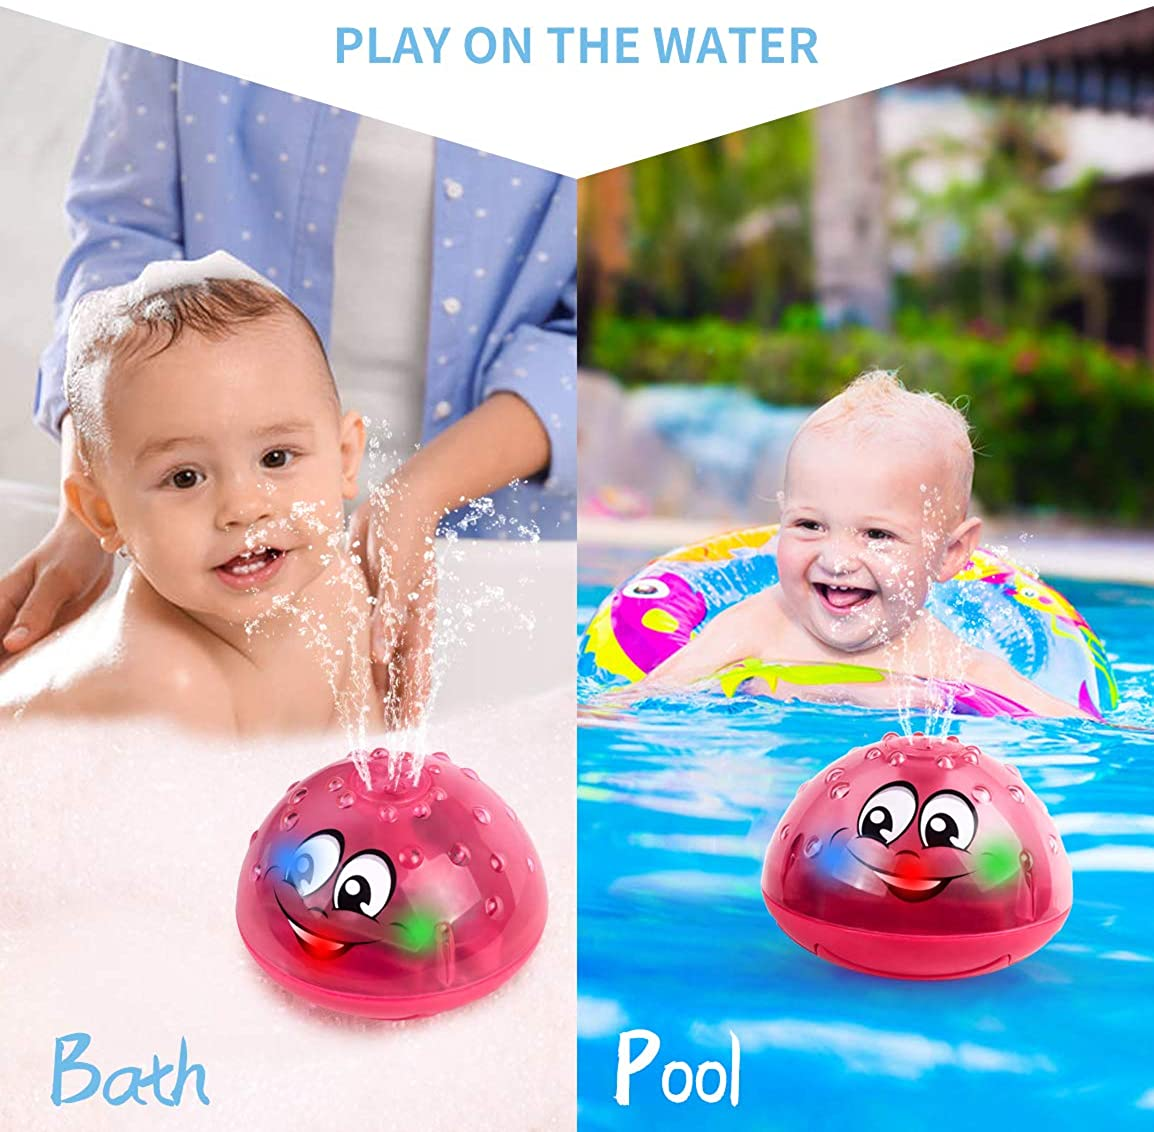 TXCAOT Baby Bath Toys,Pufferfish Spray Water Squirt Toy Float Toys Bathtub Shower Pool Bathroom Toy Bath Toys for Kids Toddlers Infant Boys and Girls Sprinkler Shower Pool Bathtub Toys for Baby